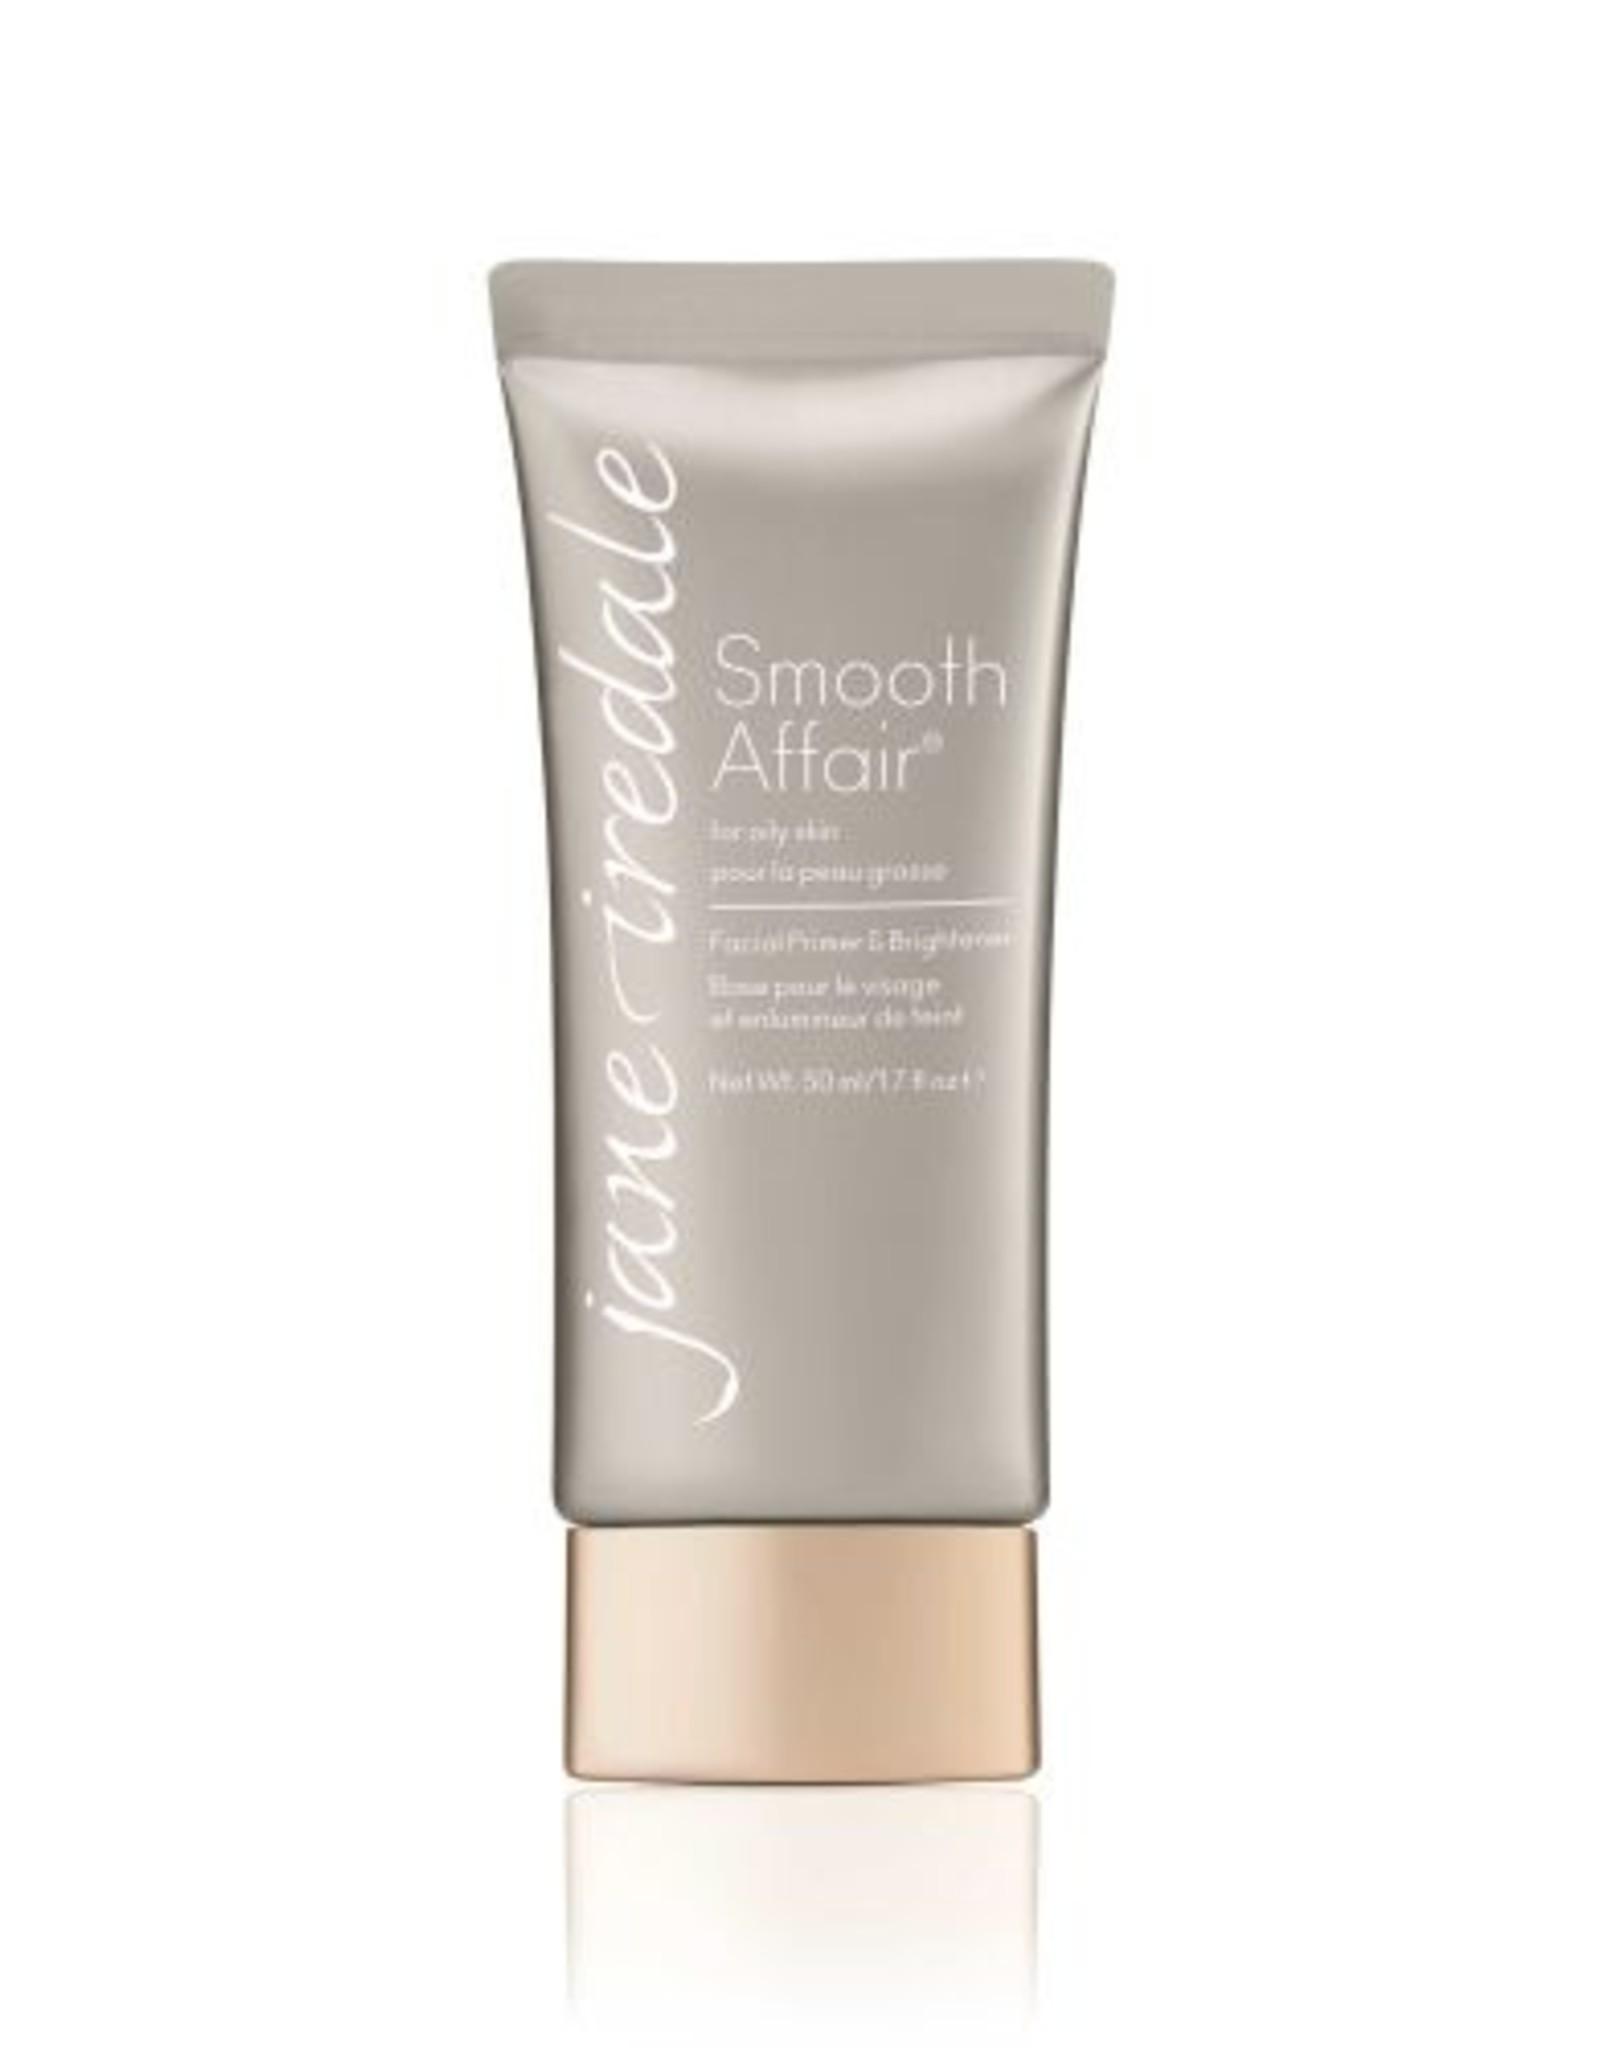 Jane Iredale Smooth Affair Primer Oily Skin